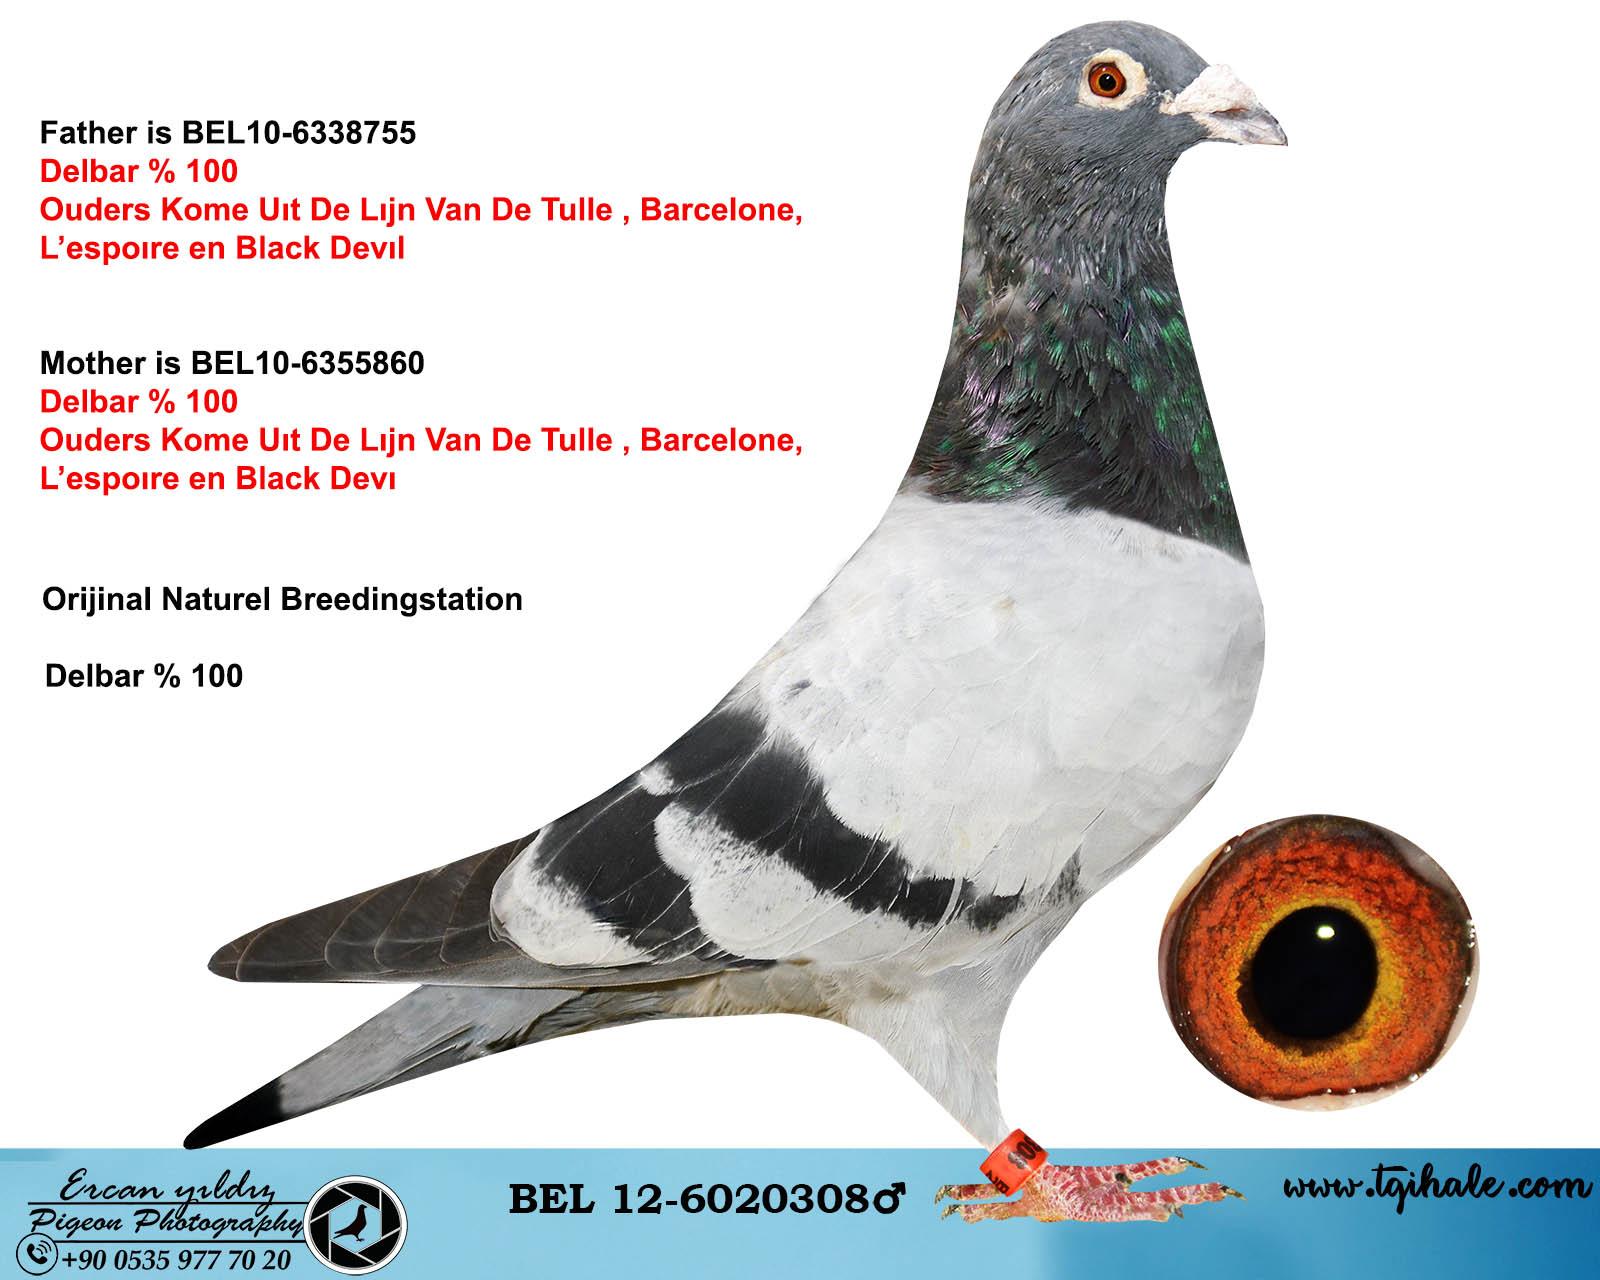 BEL12-6020308 ERKEK / NATUREL BREEDINGSTATION  DELBAR % 100